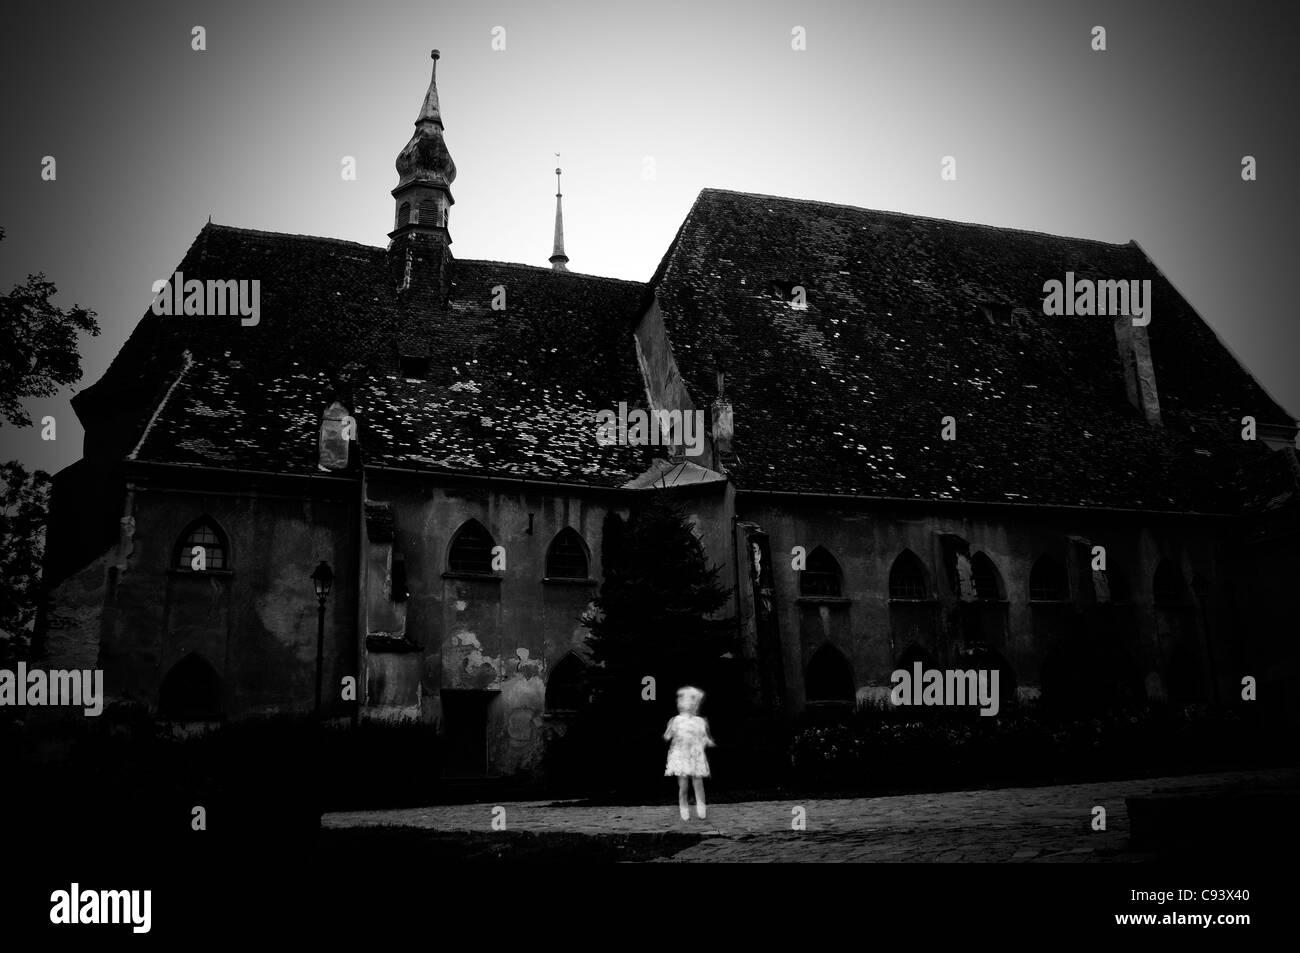 Rumania, Sighisoara.Iglesia. Apariencia fantasma Imagen De Stock